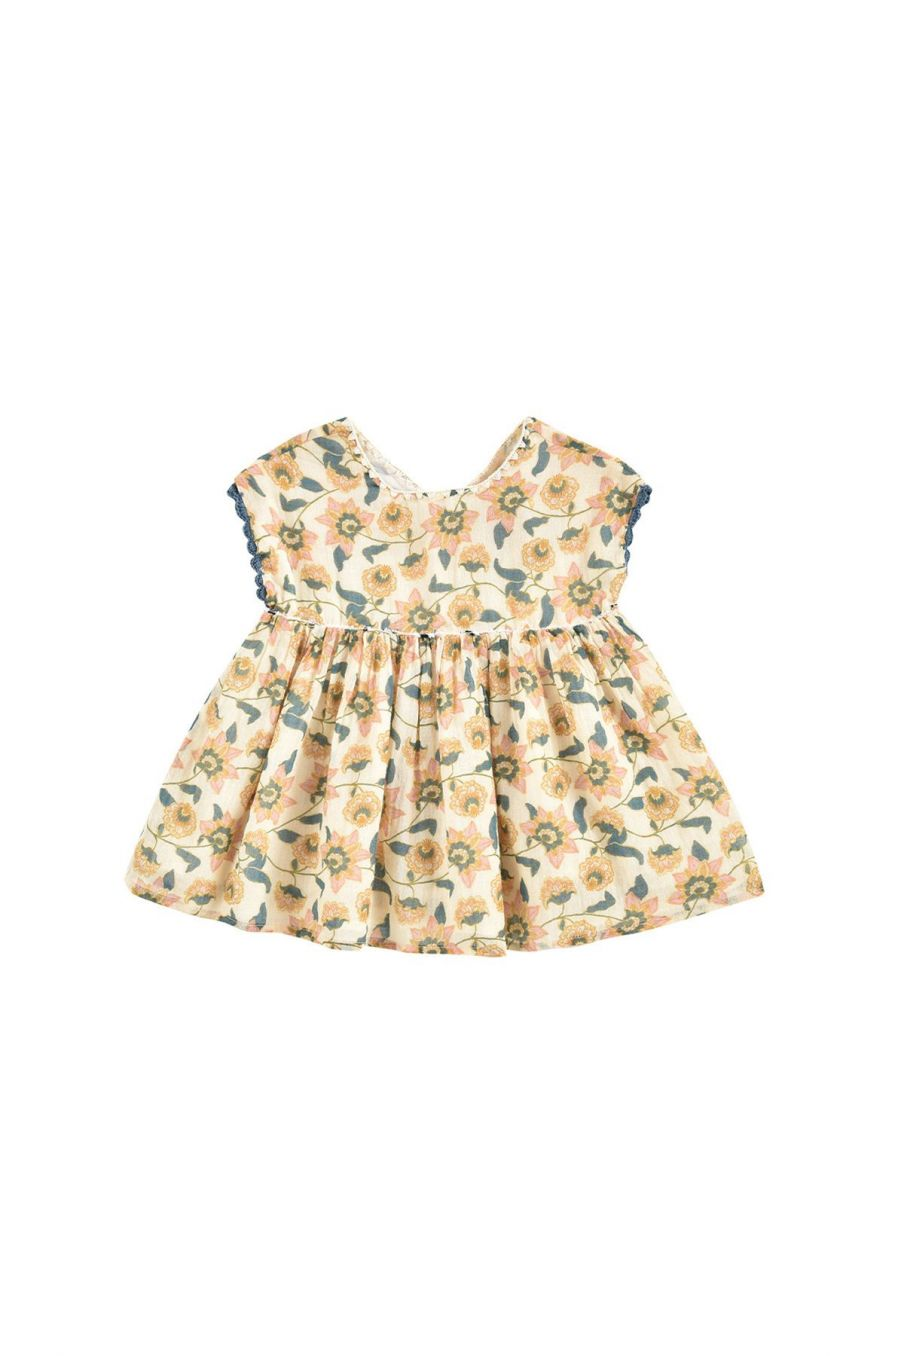 boheme chic vintage robe bébé fille tapalpa cream flowers